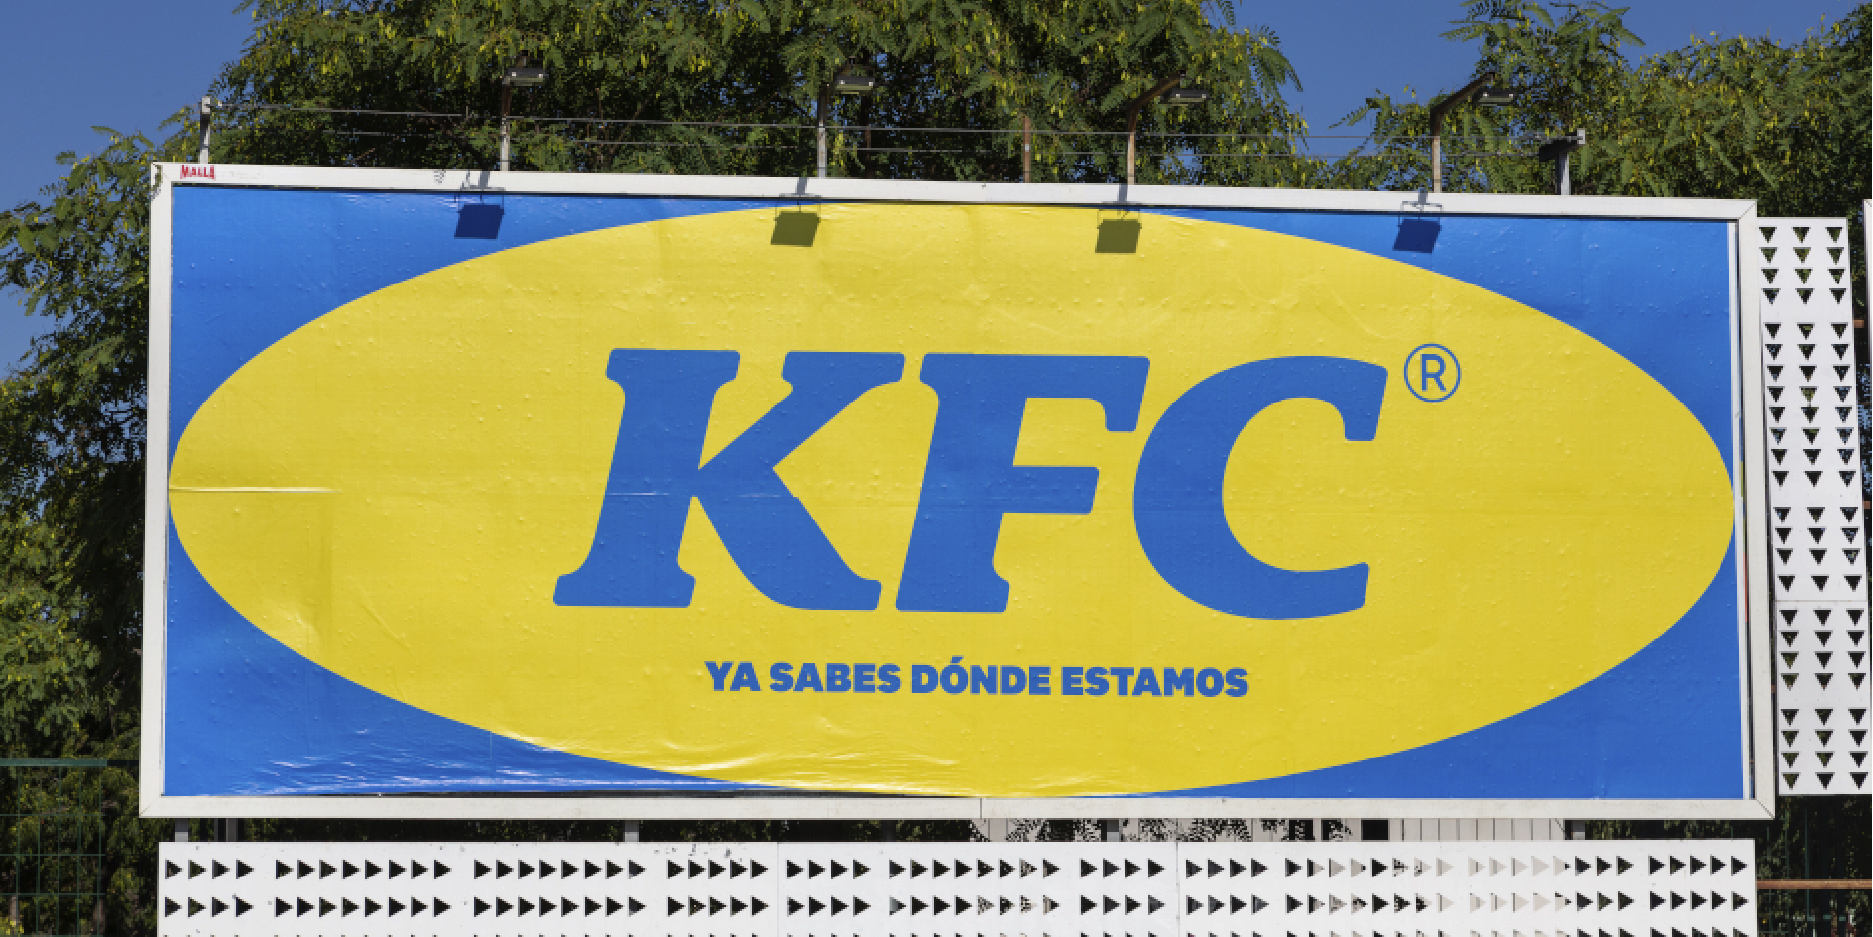 KFC se fusiona con IKEA para promocionar nuevo restaurante en palma-mallorca